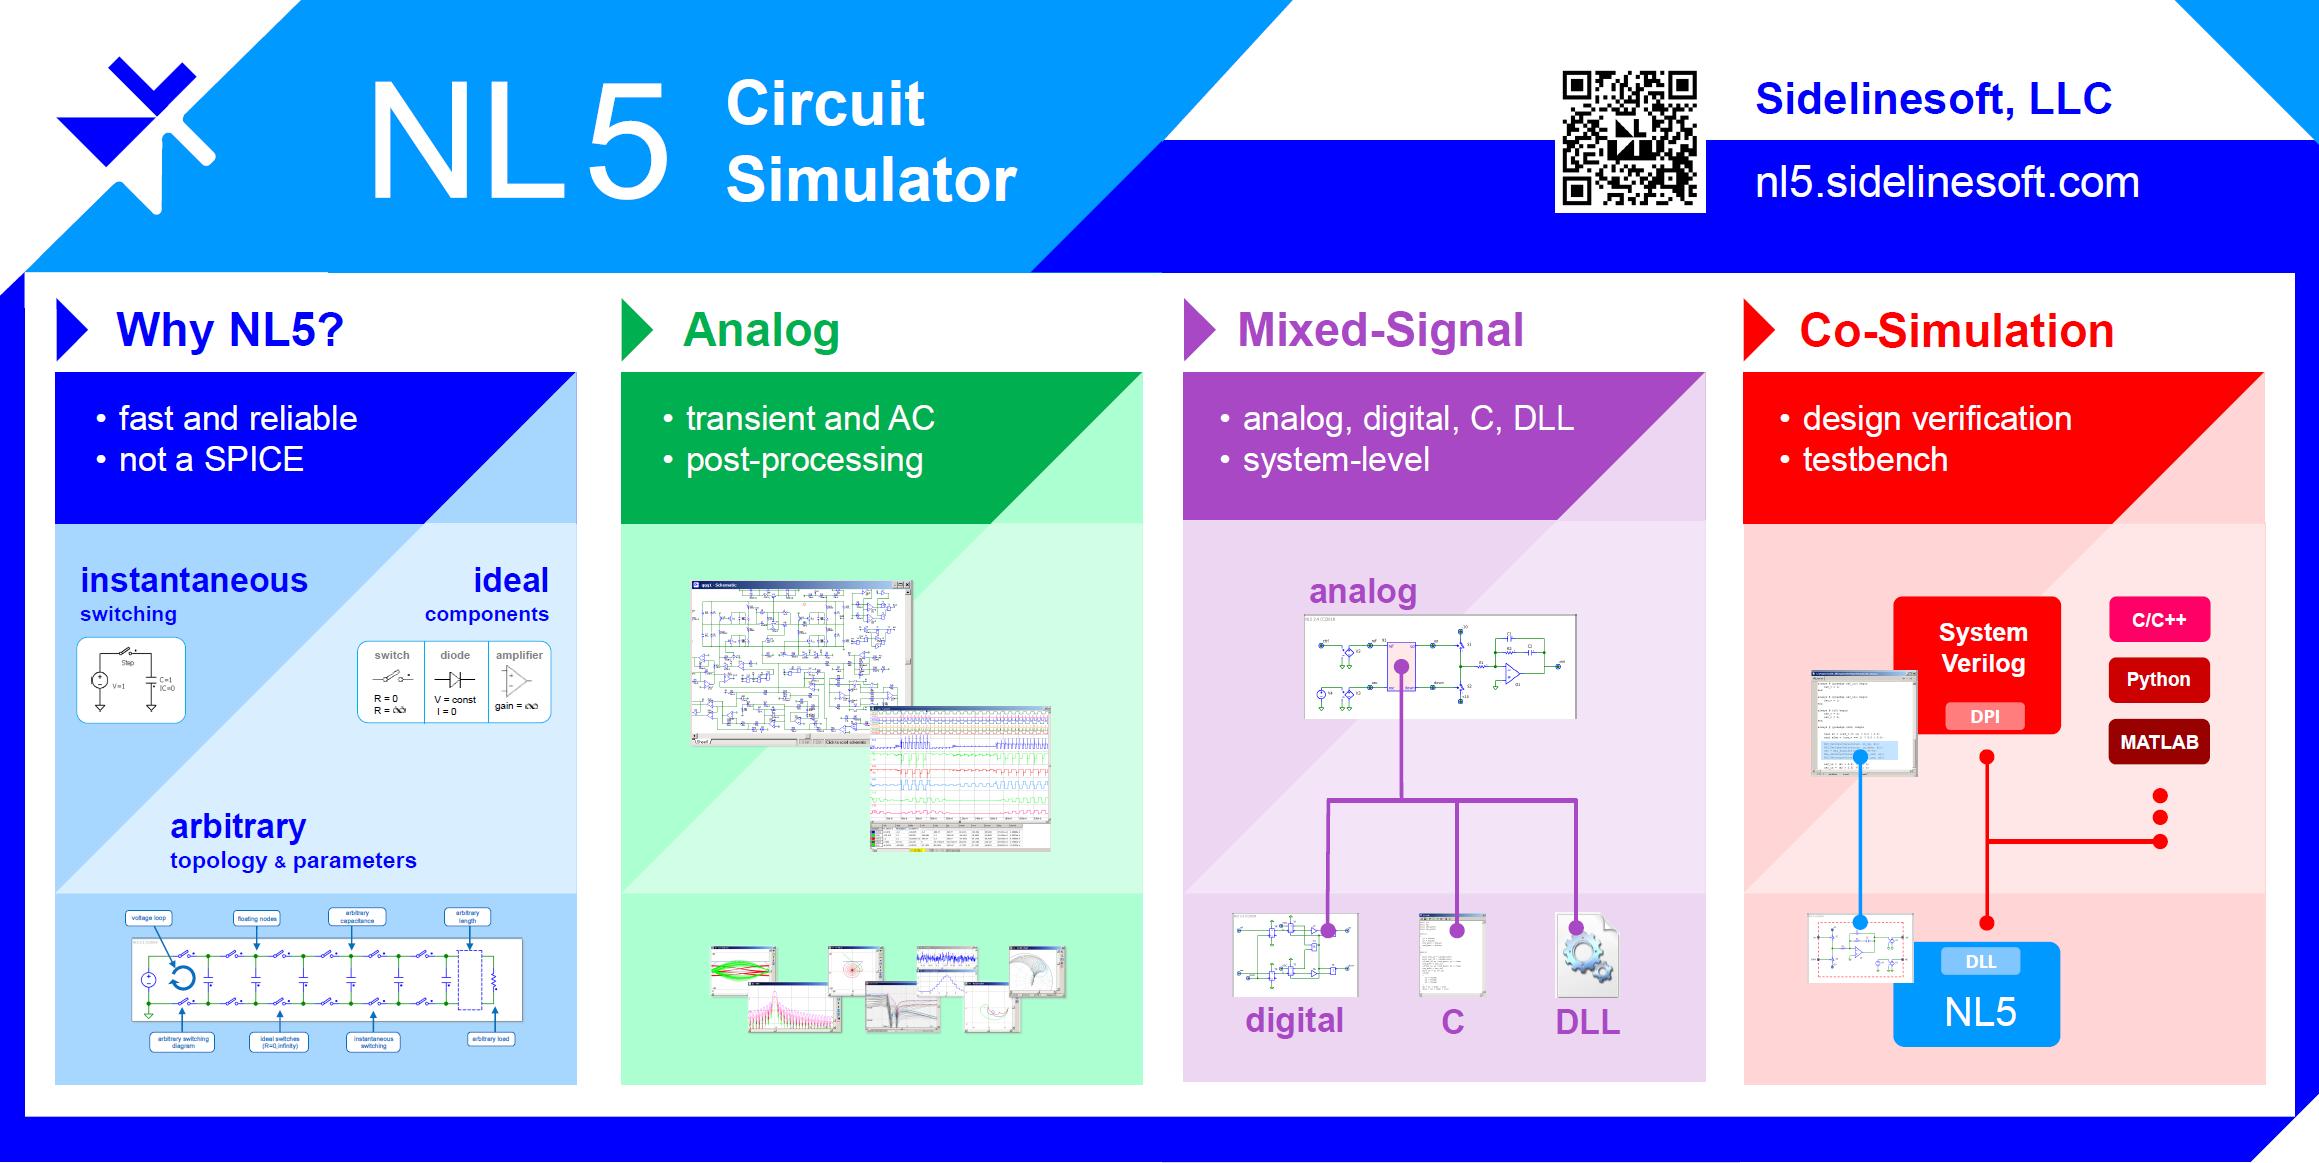 Resources Nl5 Circuit Simulator Analog Integrated Circuits Free Pdf Bookstore Apec 2018 Exhibitor Seminar 810 Kb